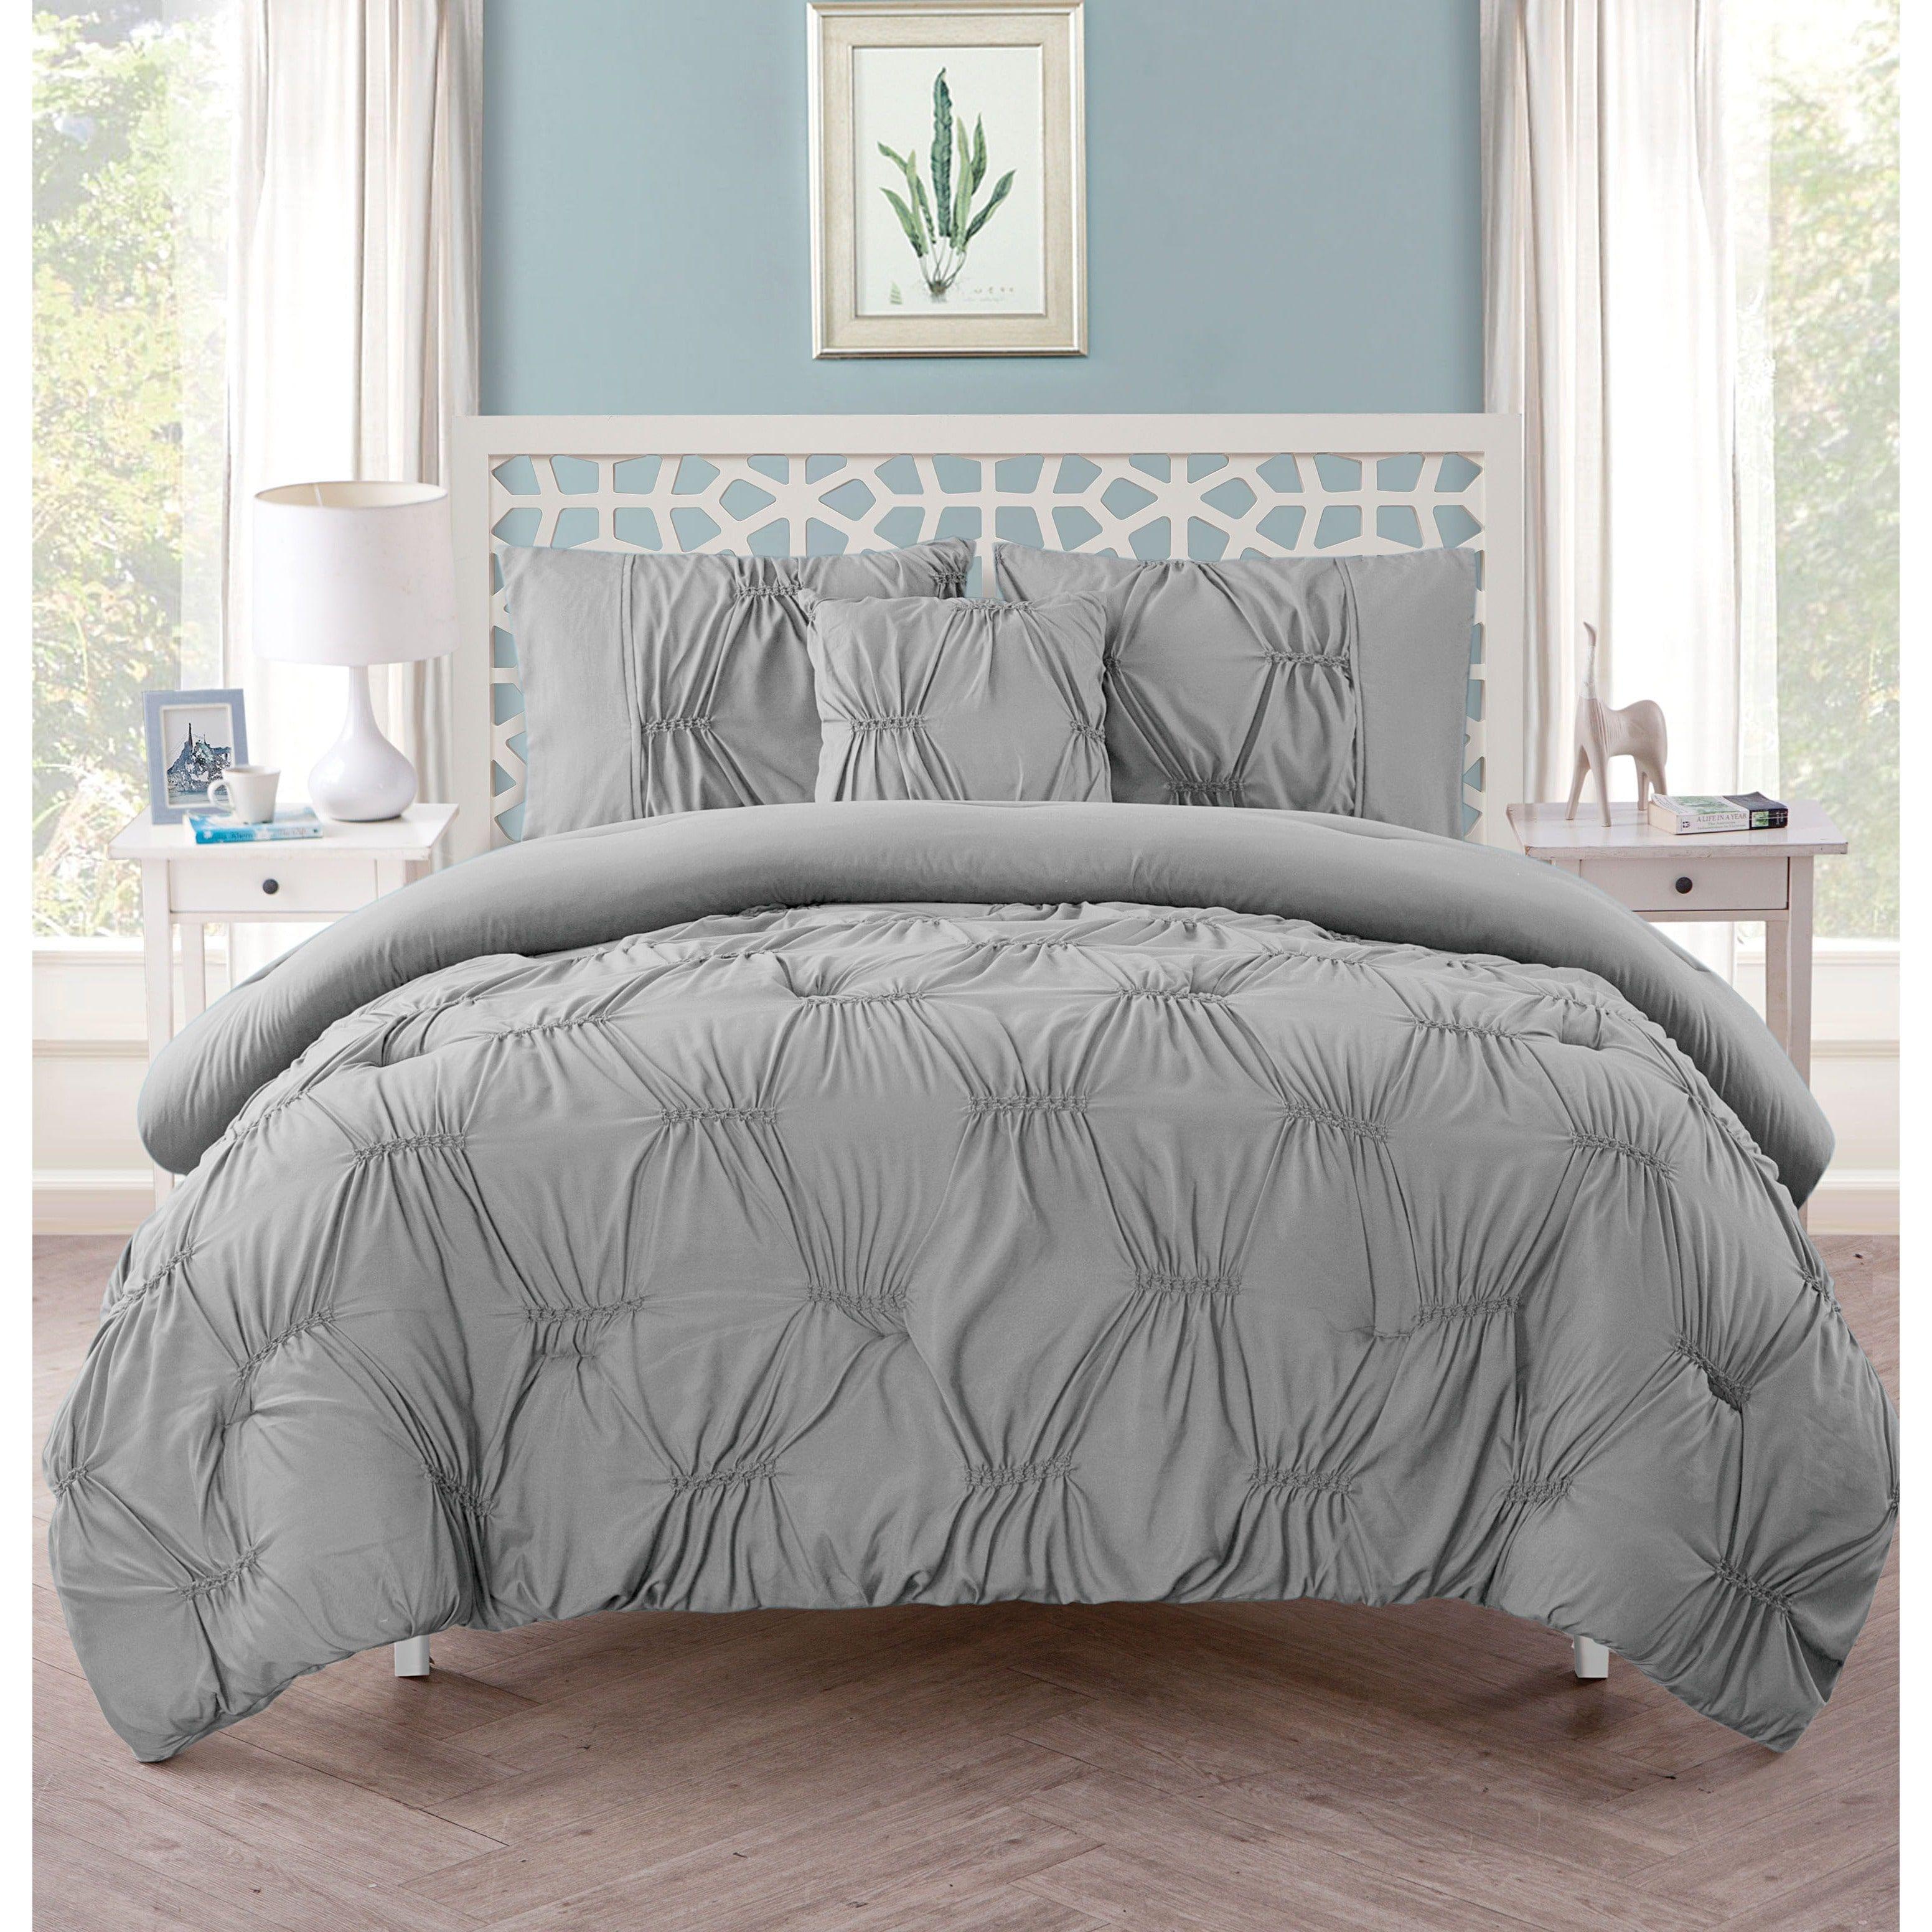 bath product free bedding cotton scene overstock set bed city pleats com piece comforter variegated